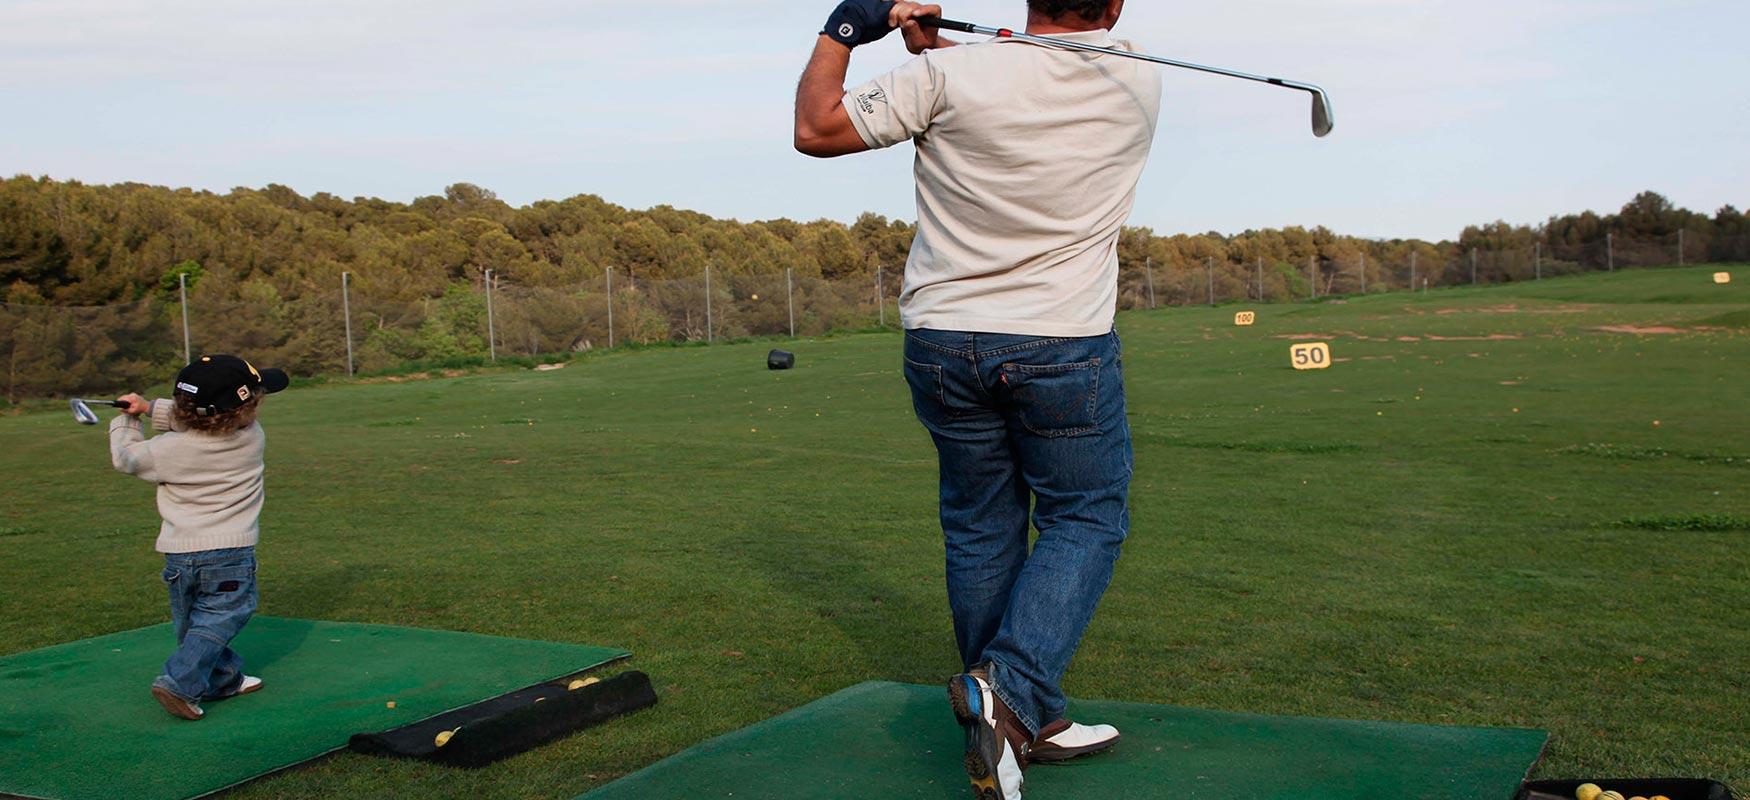 VRL-Abogados-Golf-Licencias-federativas